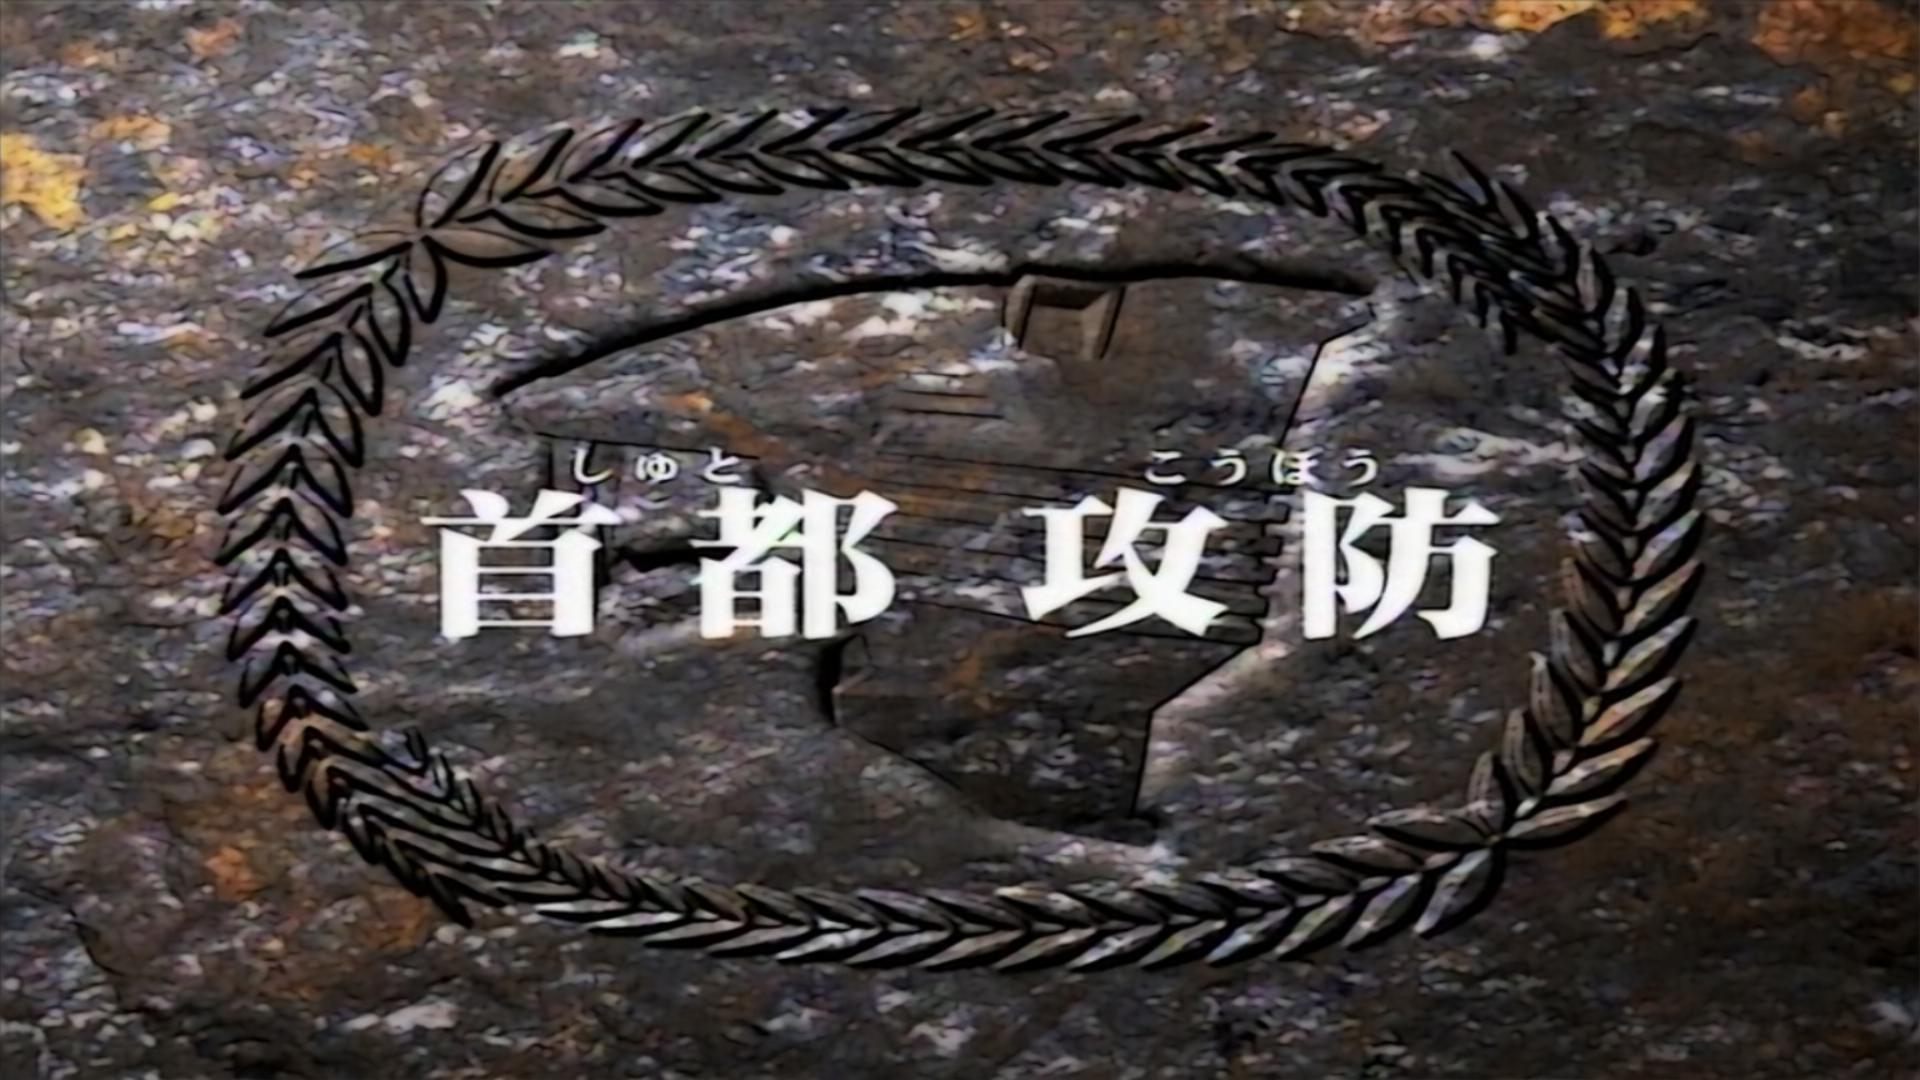 Zoids: Chaotic Century Episode 18